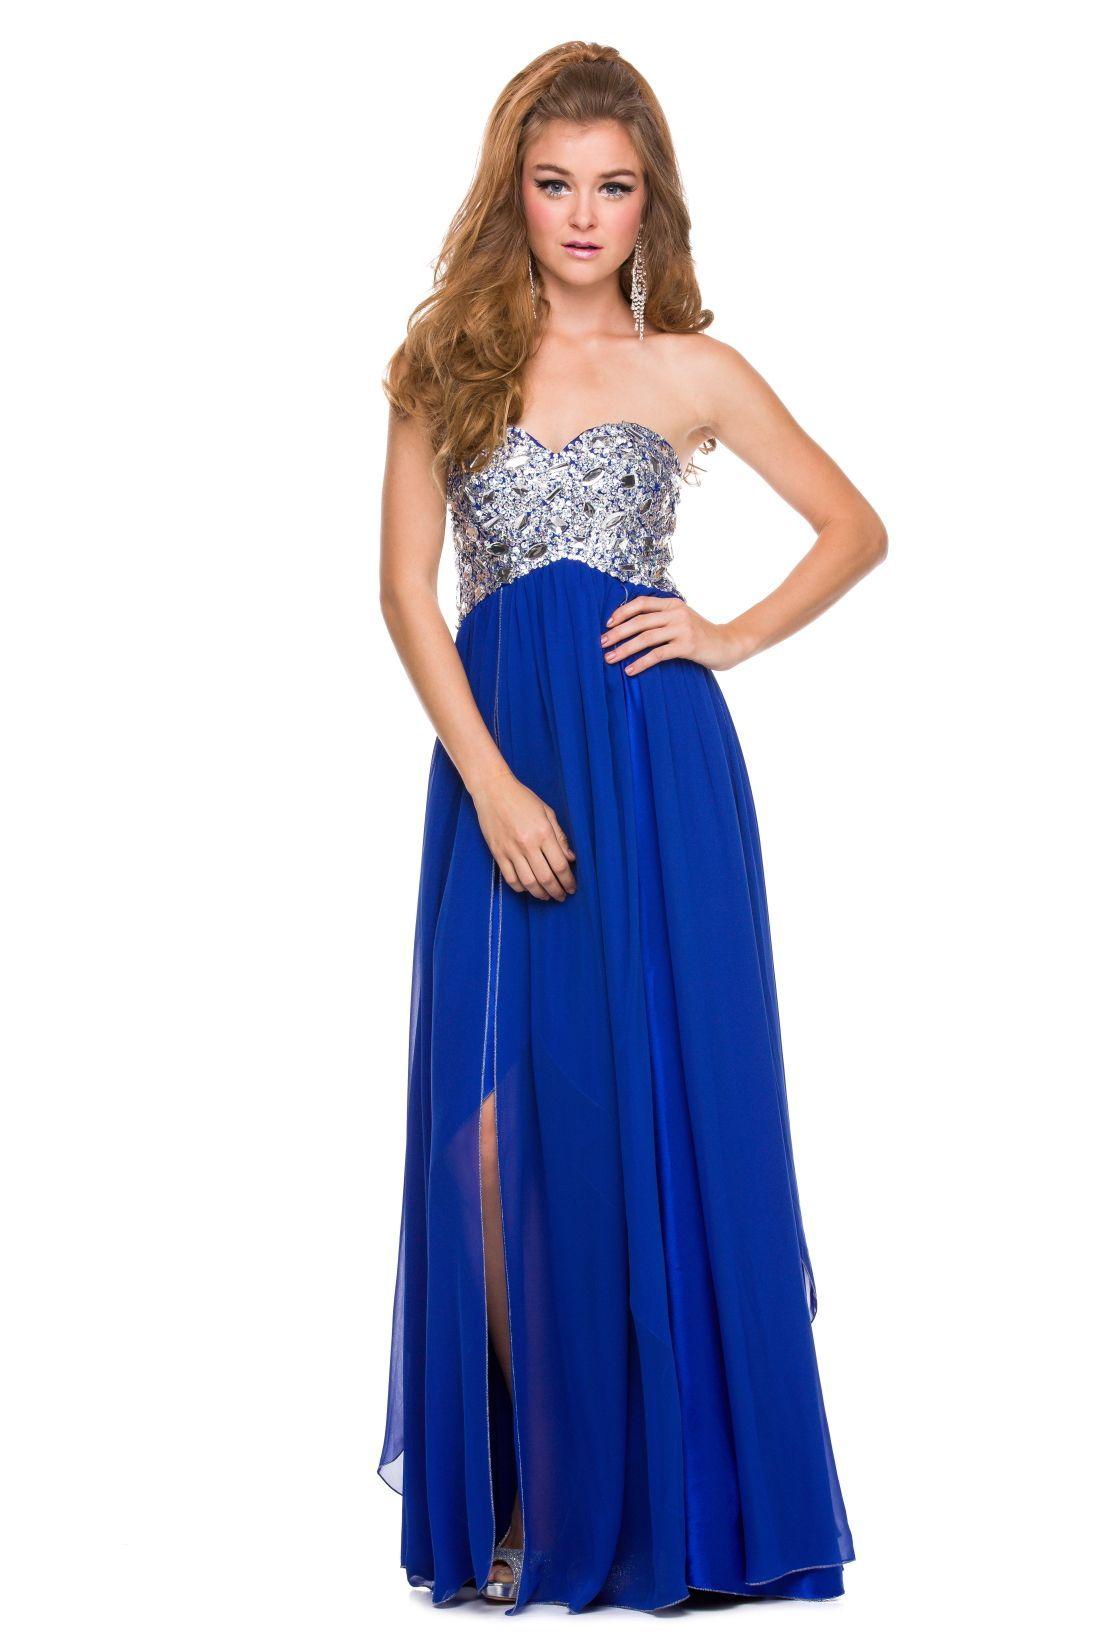 bridesmaid dresses in royal blue silver | Royal Blue Dress ...